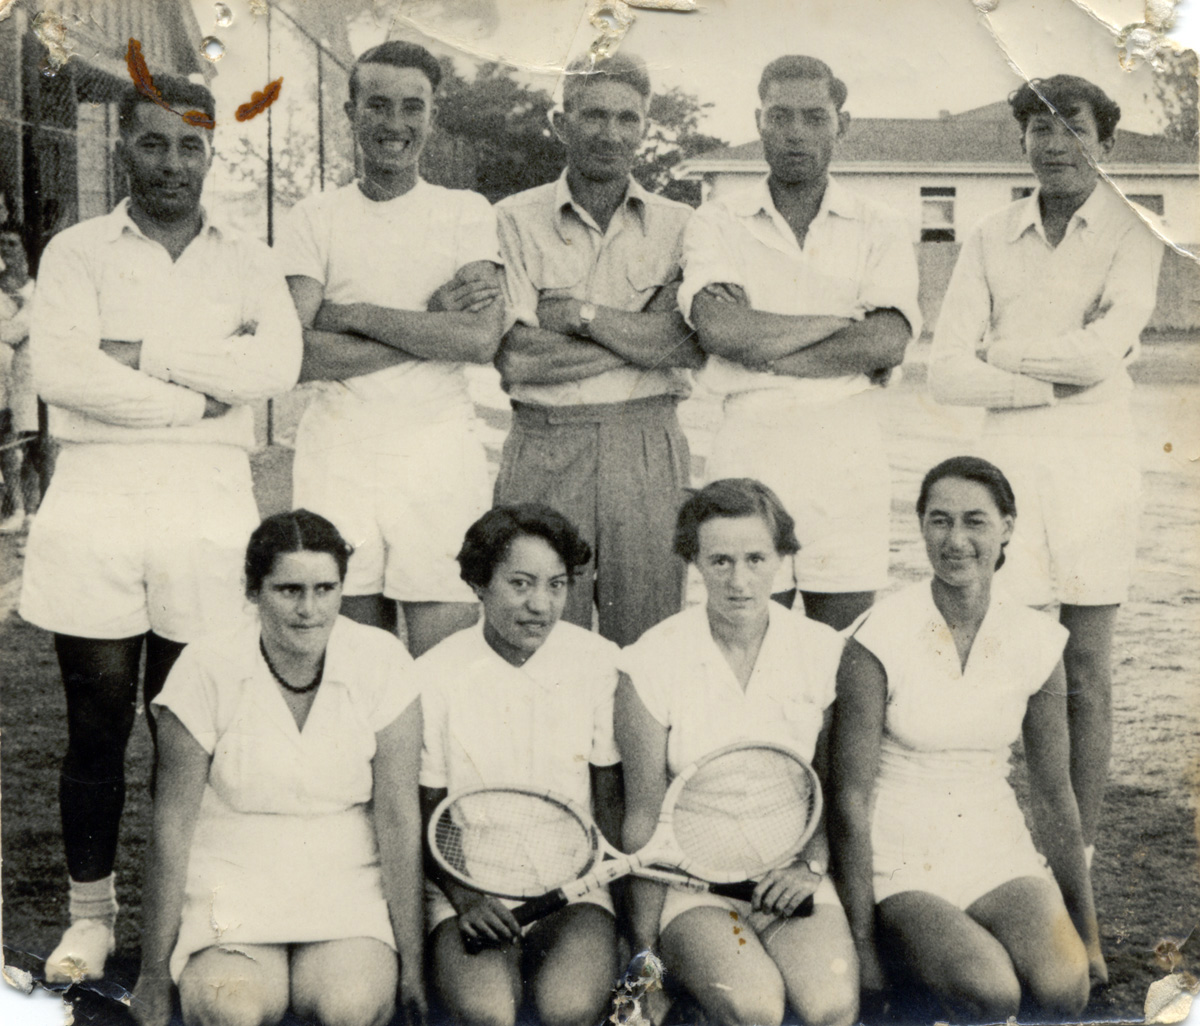 H.B.Williams Shield Team 1957 - Ruatoria Tennis Club Team (Men) Bill Hohepa, Waldo Hoia, Wattie Goldsmith (Mngr/Coach) Willie Taare, David Goldsmith (Women) Hawea Mackey, Mavis Paenga, B Dawer, Sarah Smith